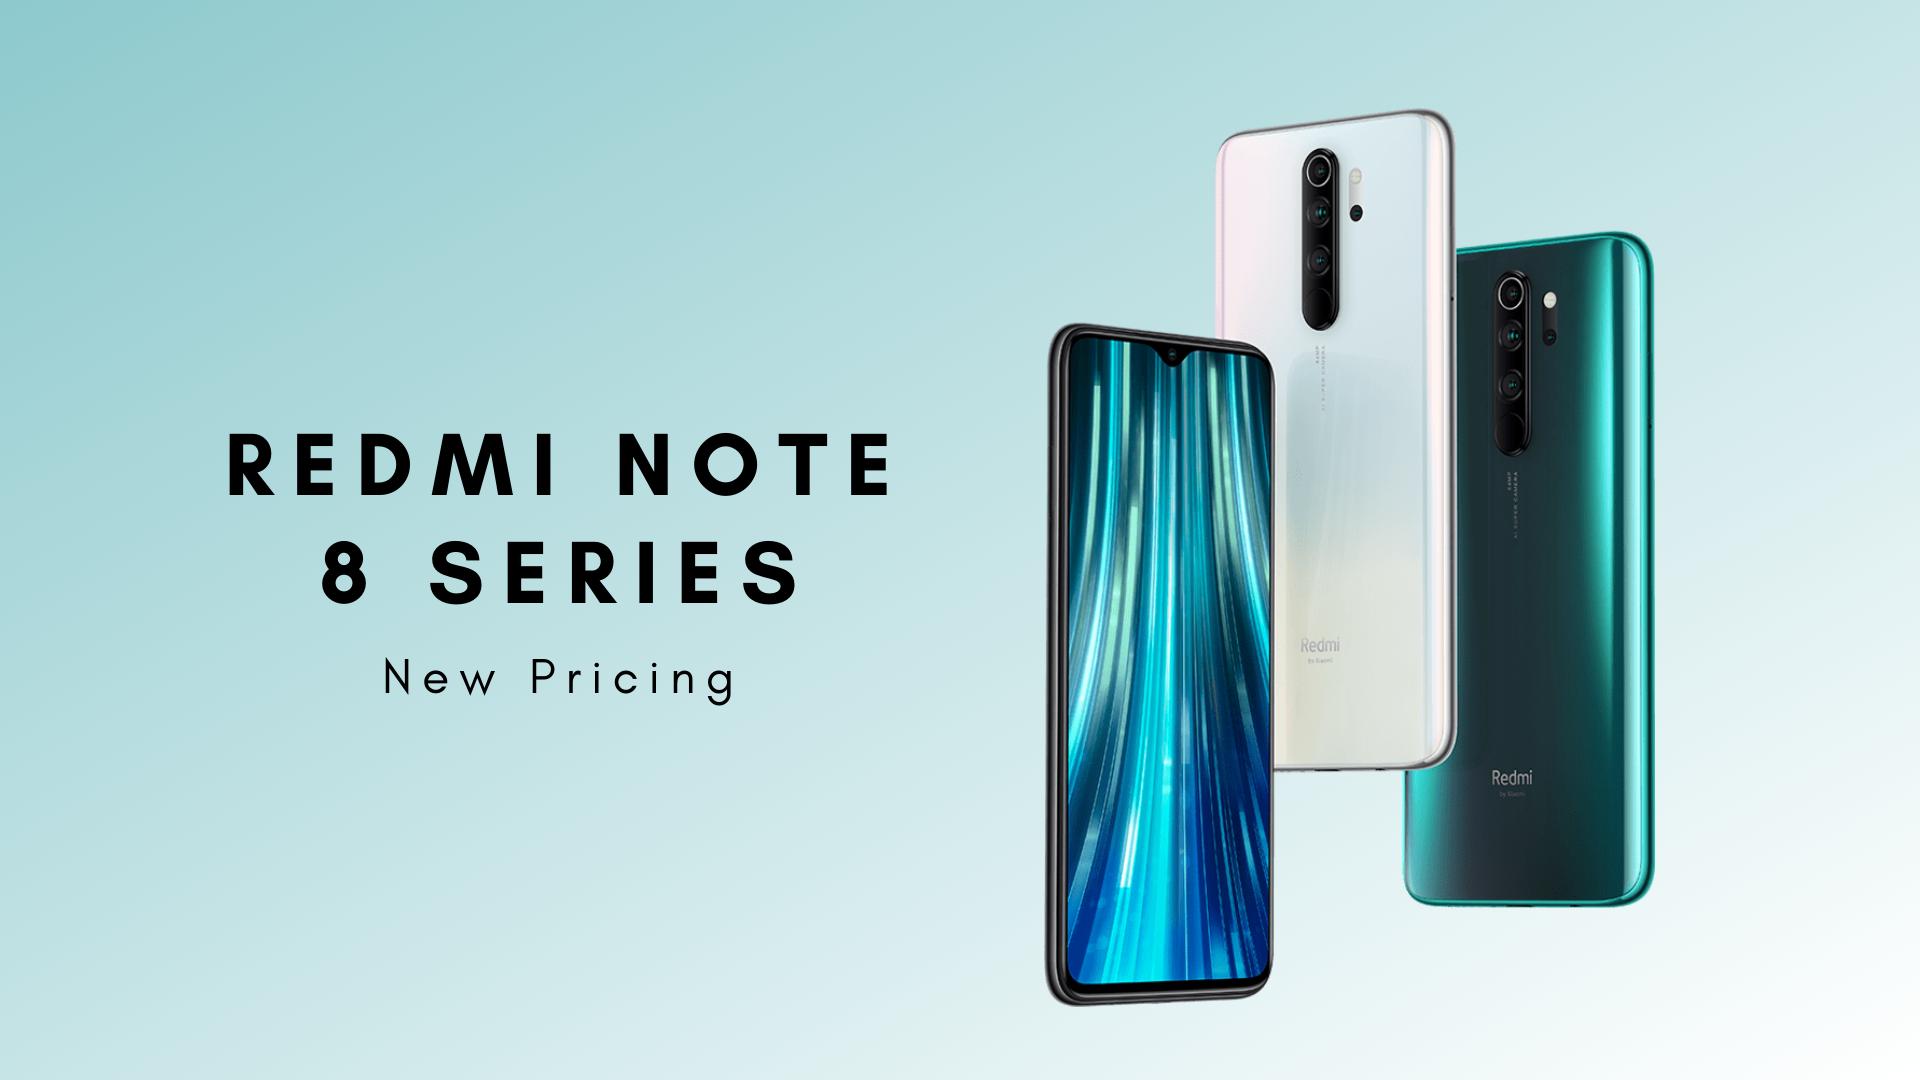 redmi note 8 series new price